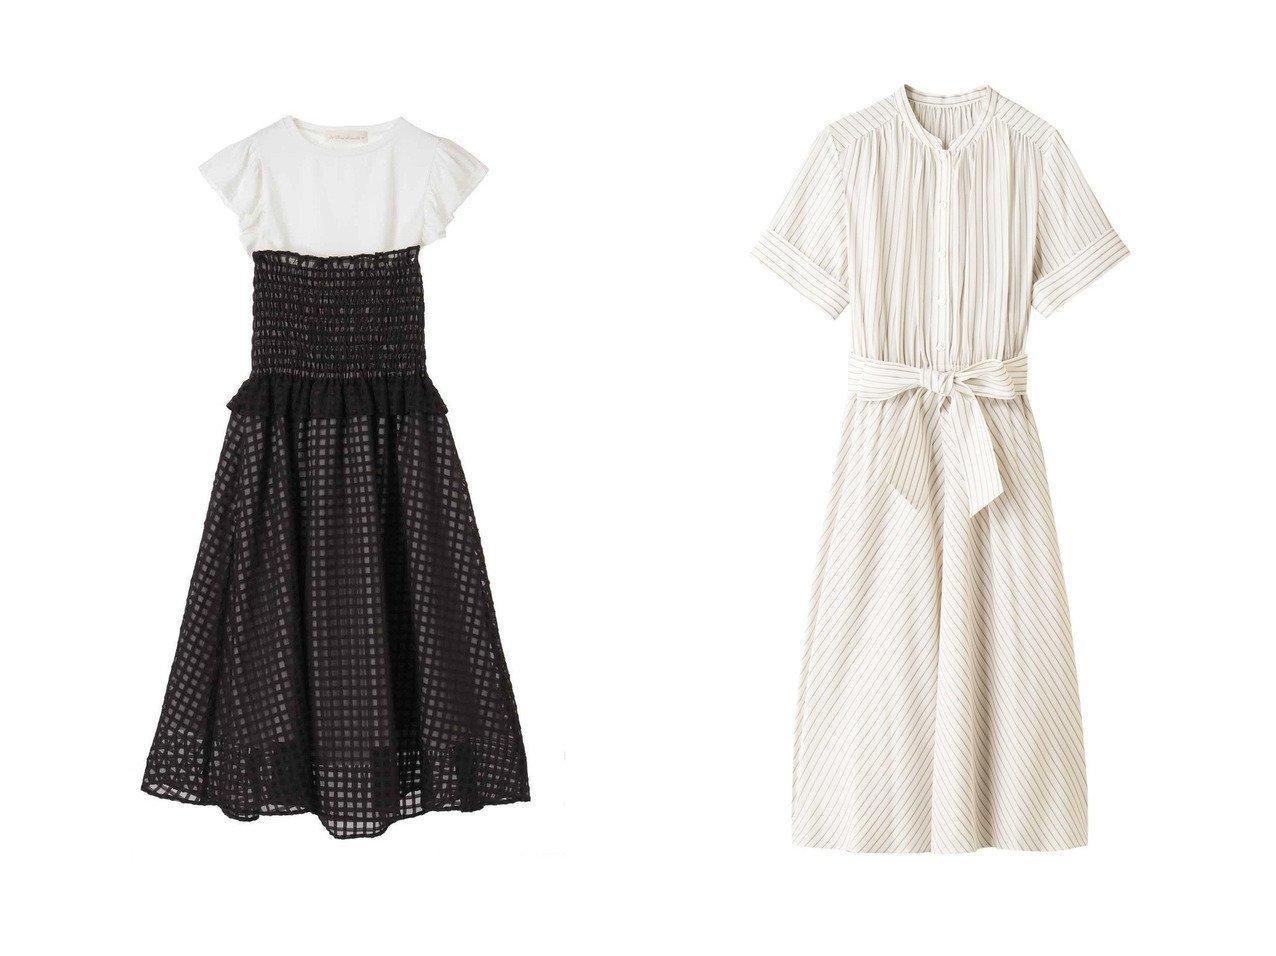 【31 Sons de mode/トランテアン ソン ドゥ モード】のTシャツ付きギンガムワンピース&【ANAYI/アナイ】のストライプスタンドカラーシャツワンピース ワンピース・ドレスのおすすめ!人気、トレンド・レディースファッションの通販 おすすめで人気の流行・トレンド、ファッションの通販商品 メンズファッション・キッズファッション・インテリア・家具・レディースファッション・服の通販 founy(ファニー) https://founy.com/ ファッション Fashion レディースファッション WOMEN ワンピース Dress シャツワンピース Shirt Dresses インナー エアリー ガーリー ギンガム シャーリング スリーブ チェック バランス フィット フリル フレンチ オケージョン ストライプ |ID:crp329100000009358